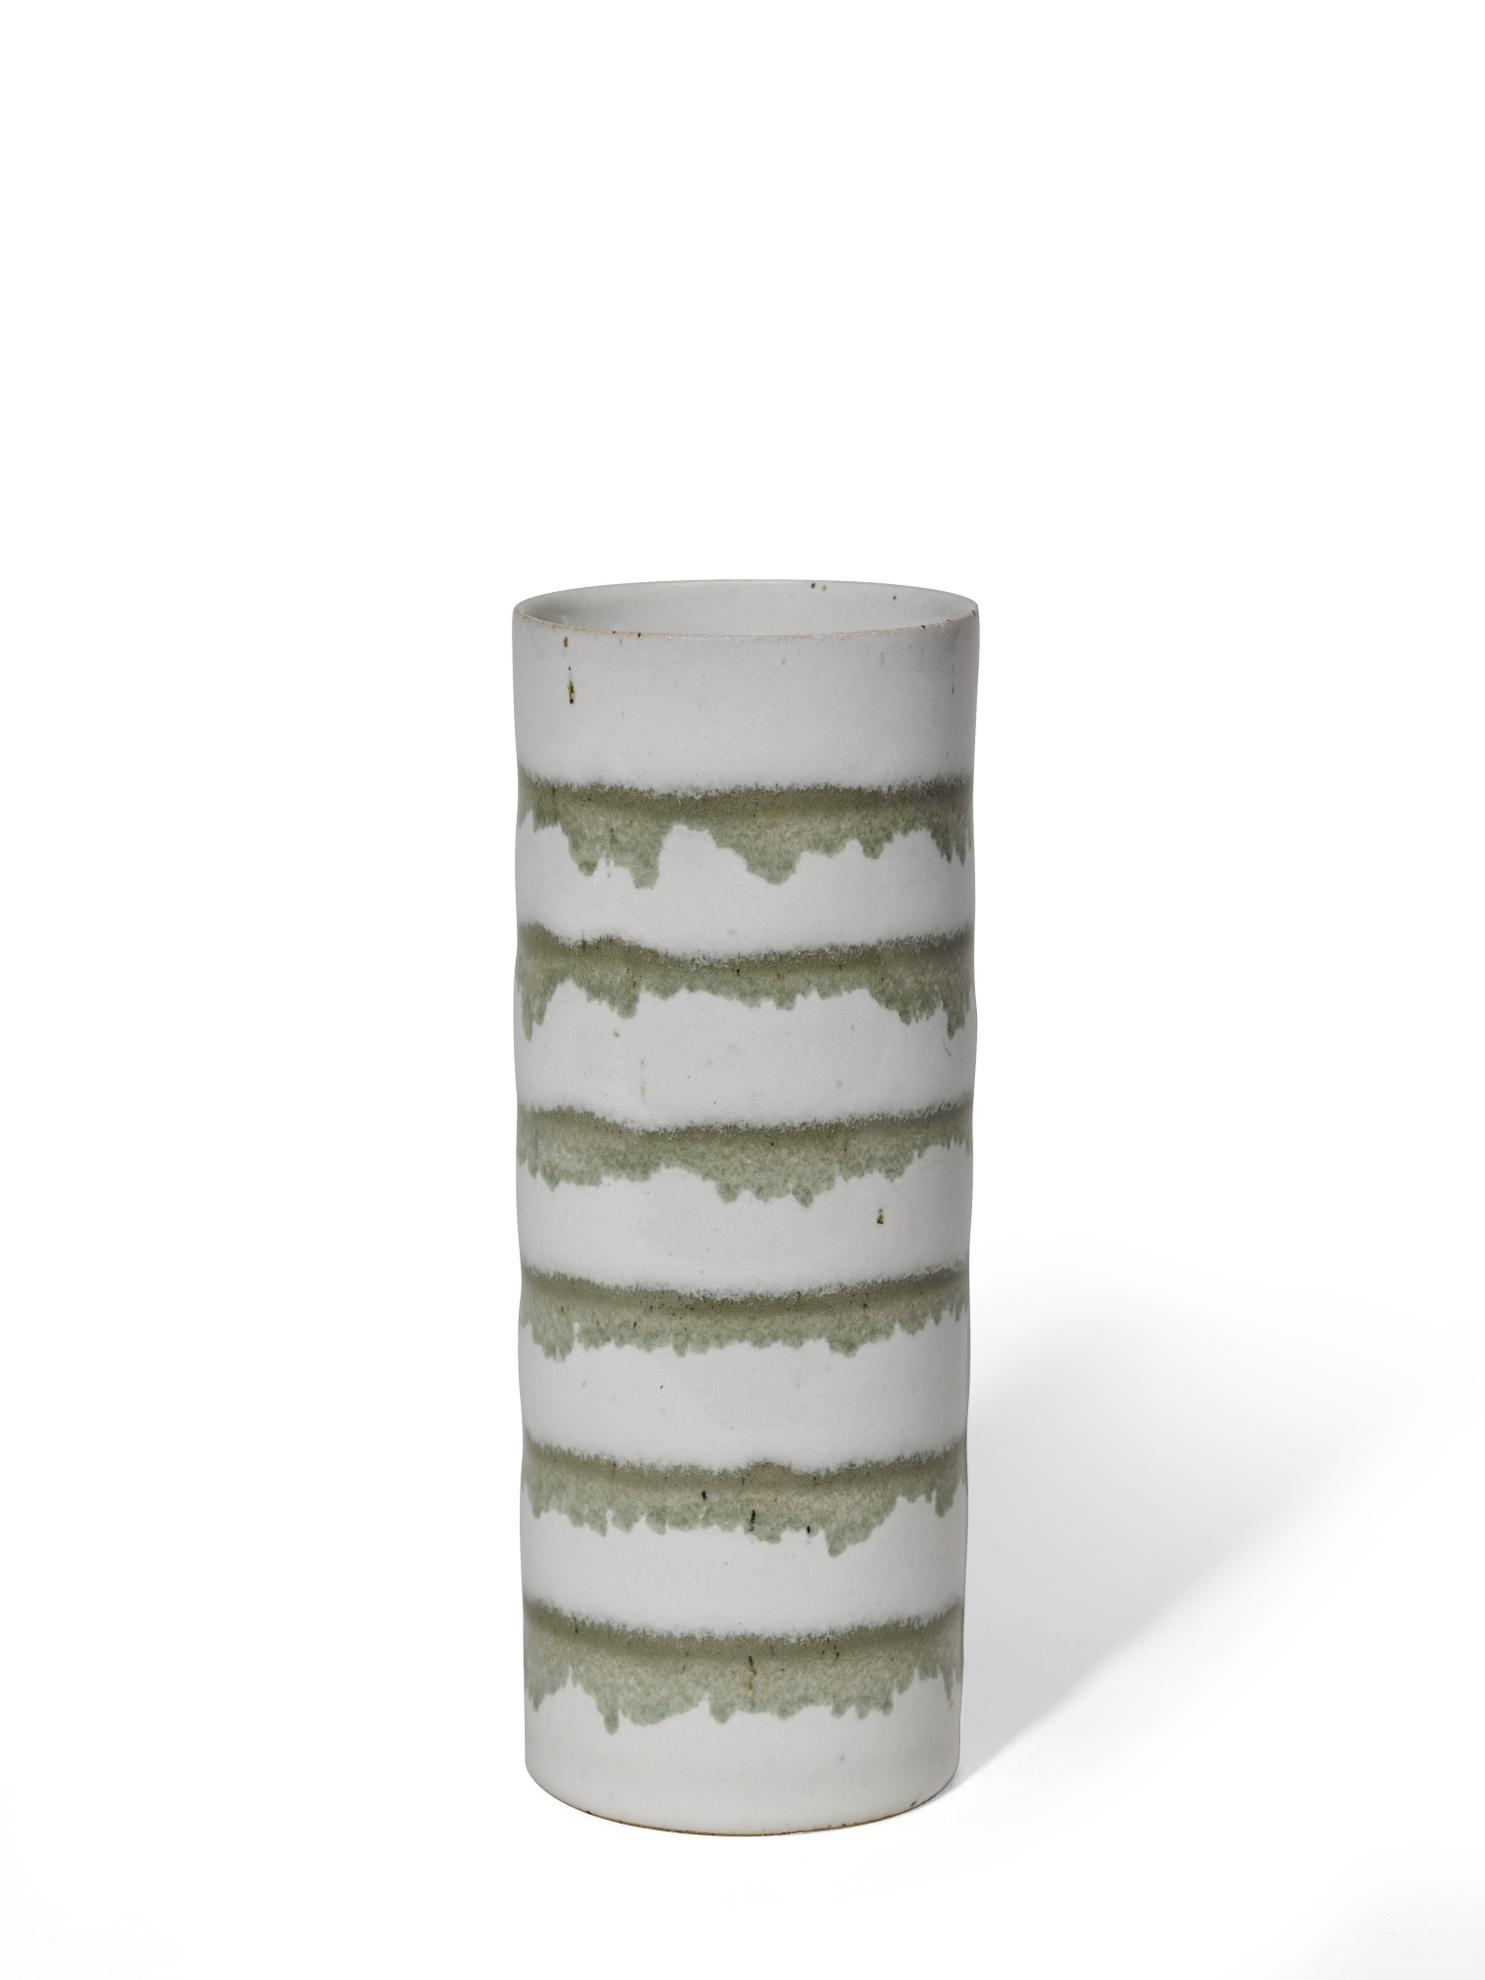 Rupert Spira-Vase-1990